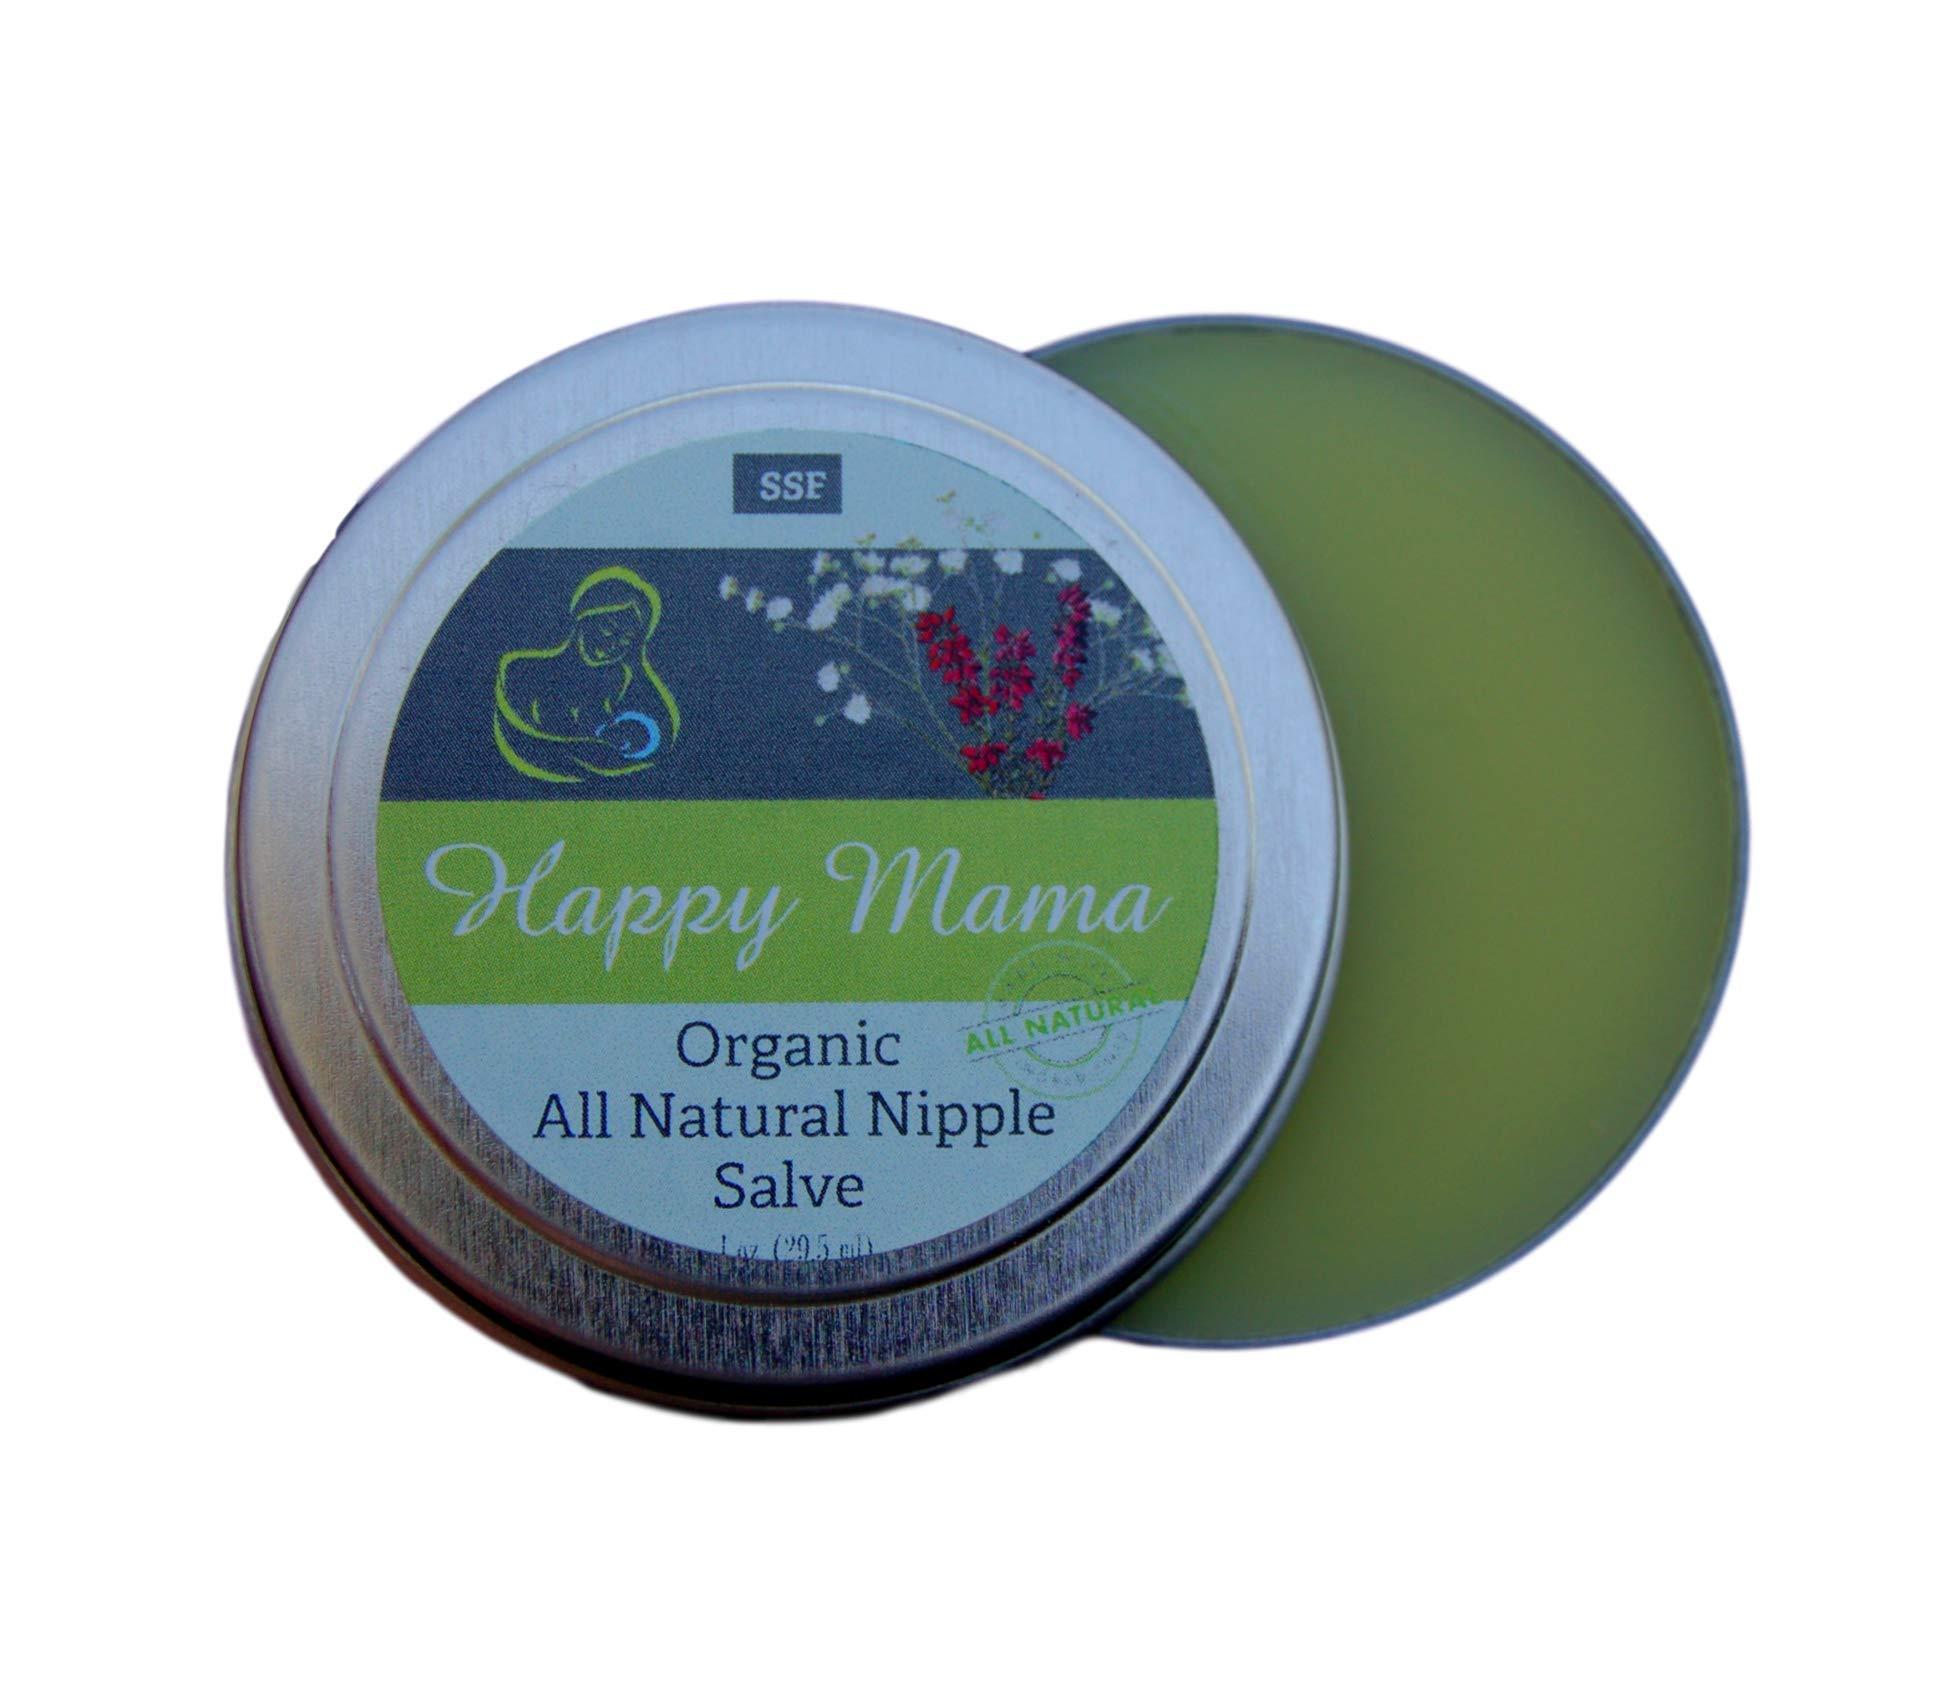 Happy Mama- Moisturizing Super Concentrated Organic Nipple Salve. Lanolin Free, Non GMO calendula nipple cream for breastfeeding mamas, and anyone with dry skin.